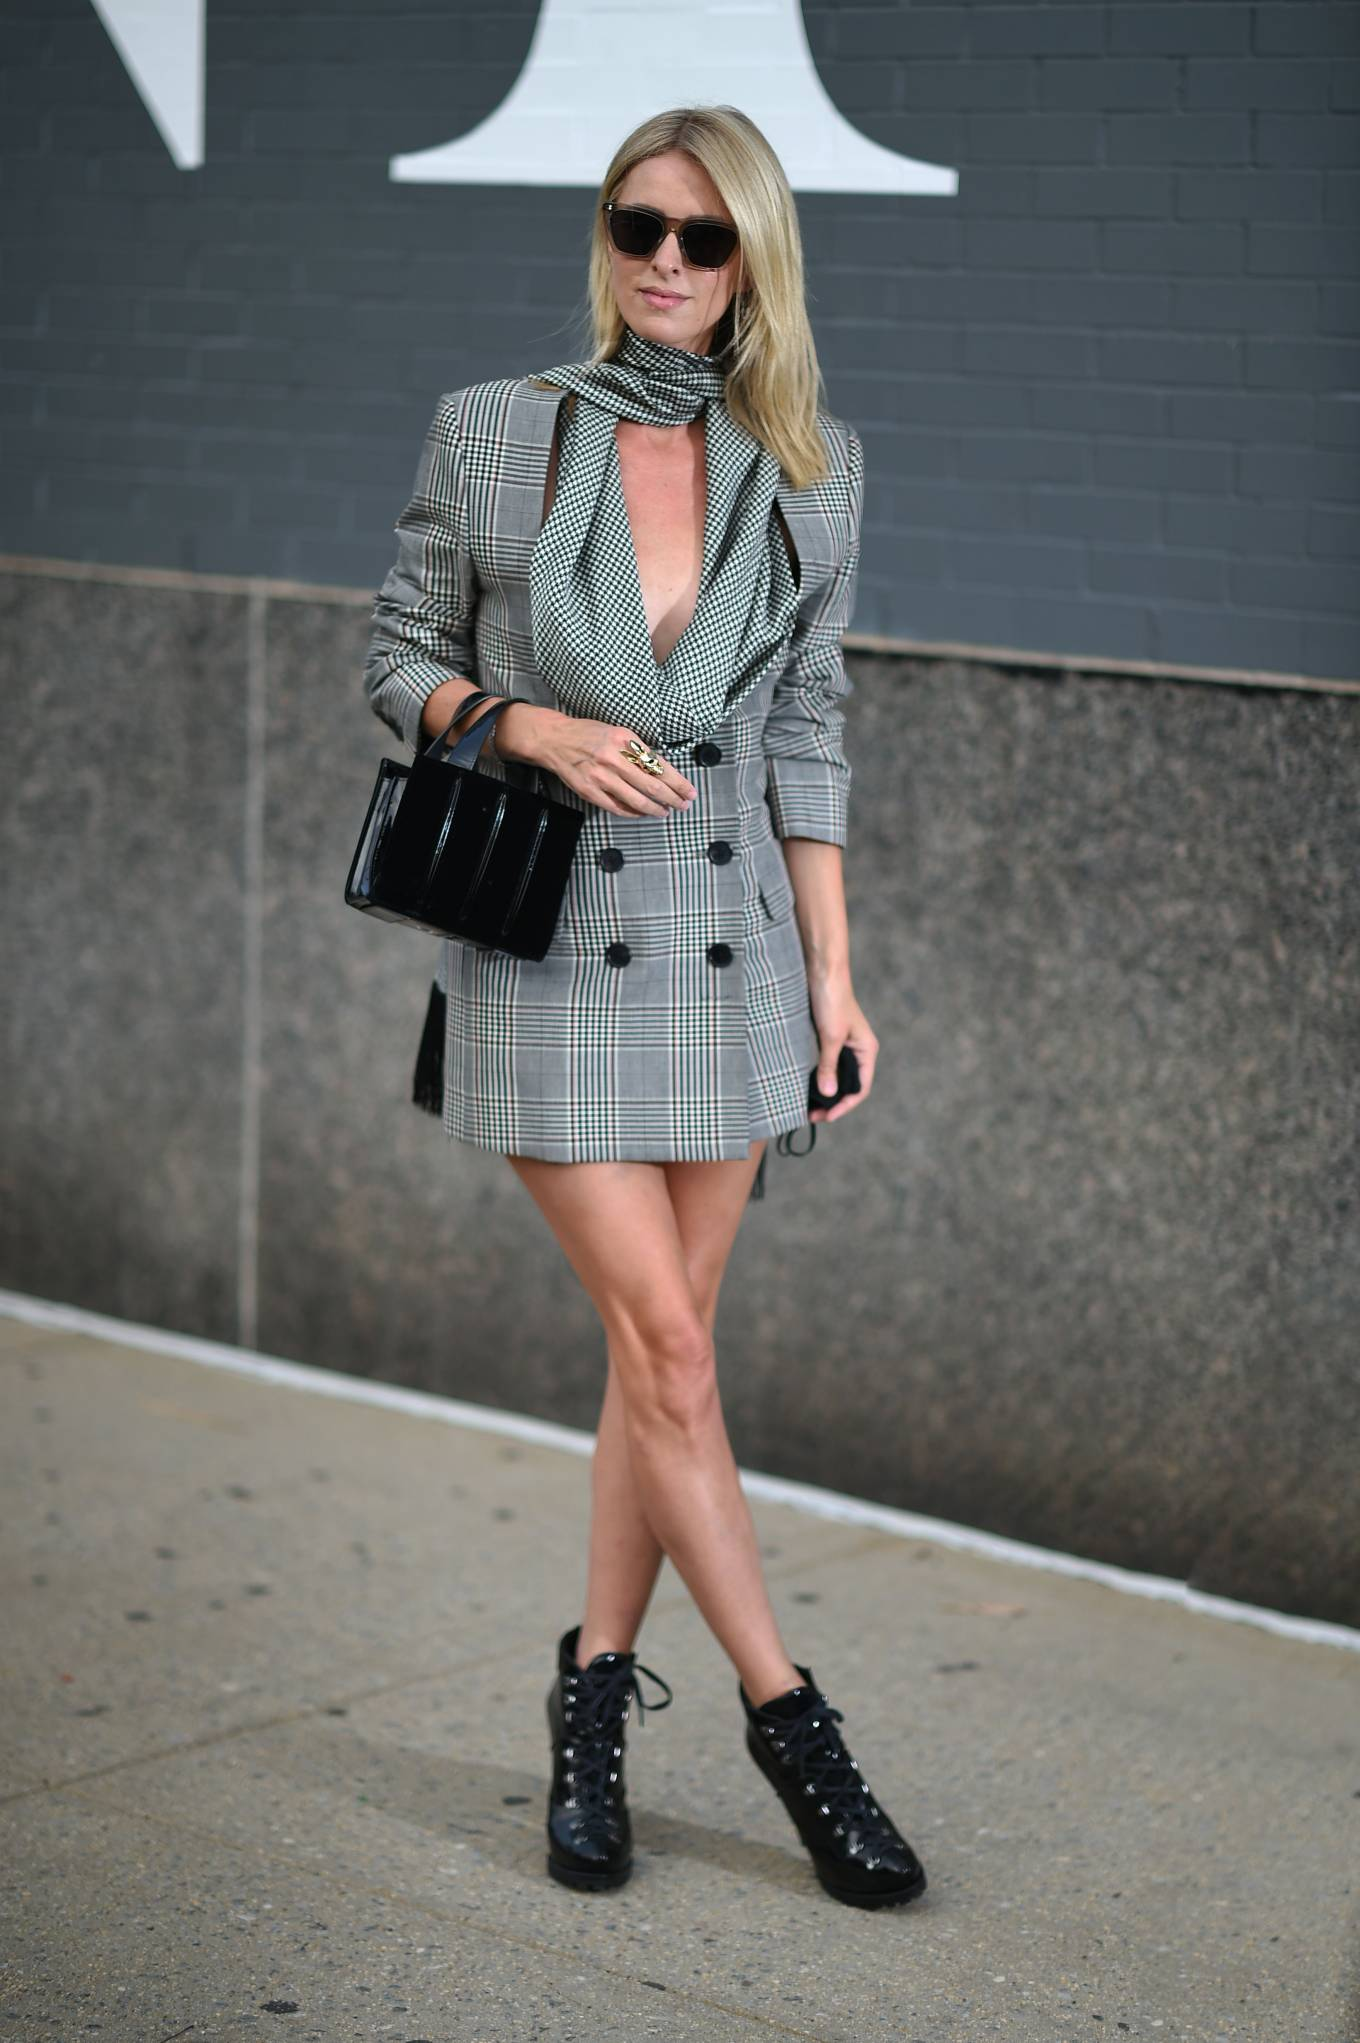 Nicky Hilton 2020 : Nicky Hilton – New York Fashion Week – Monse Fall-Winter 2020 Presentation-02